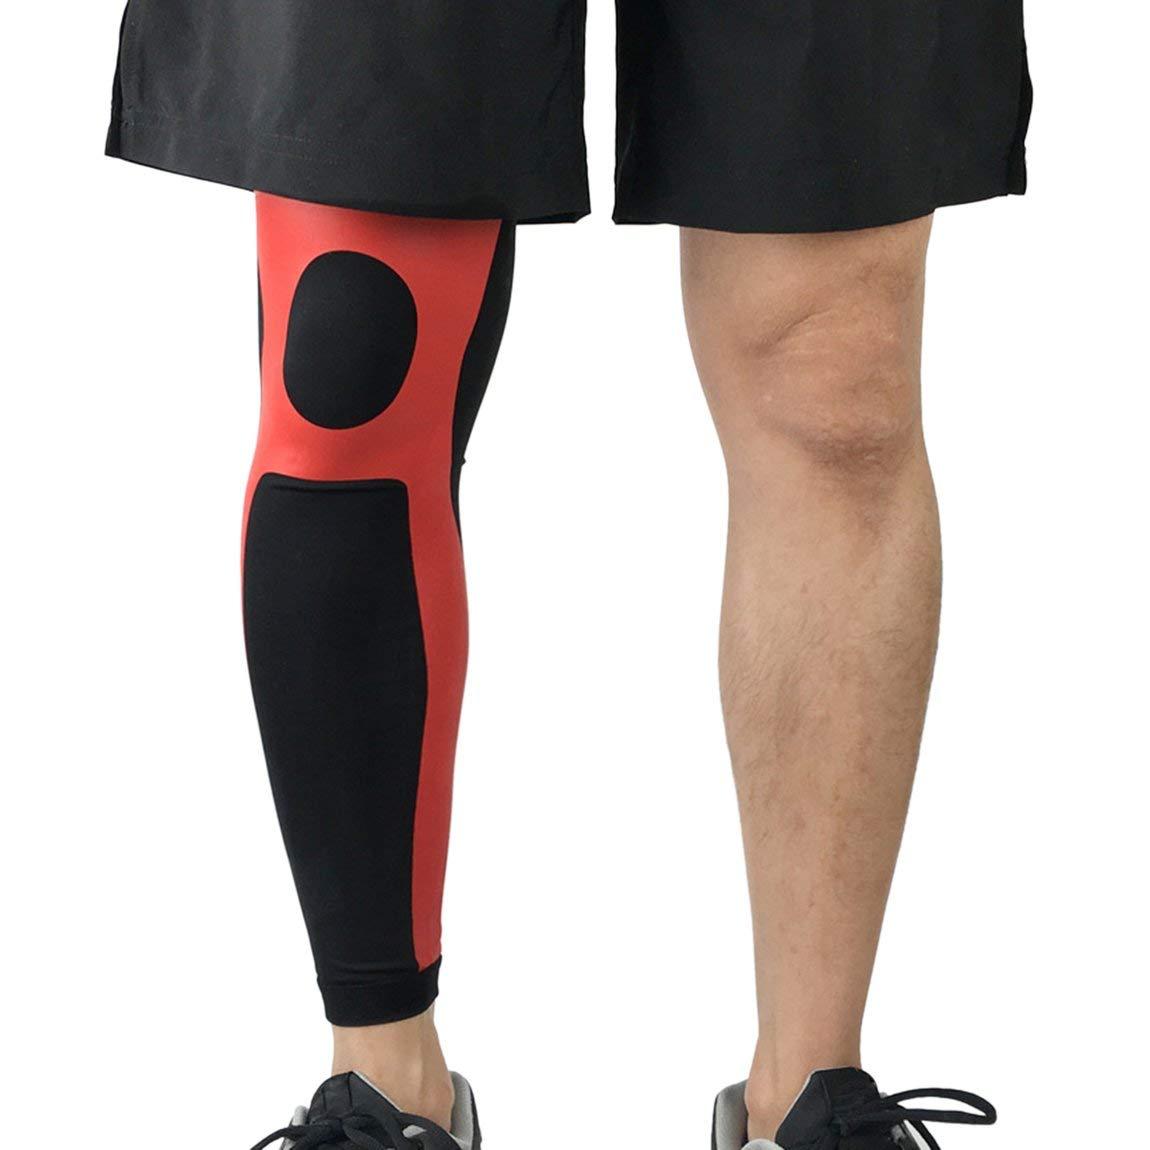 Amazon.com : SeniorMar 1 PC Basketball Football Leg Shin Guards Soccer Protective Calf Sleeves Cycling Running Fitness Calcetines Sports Kneepad - Black ...